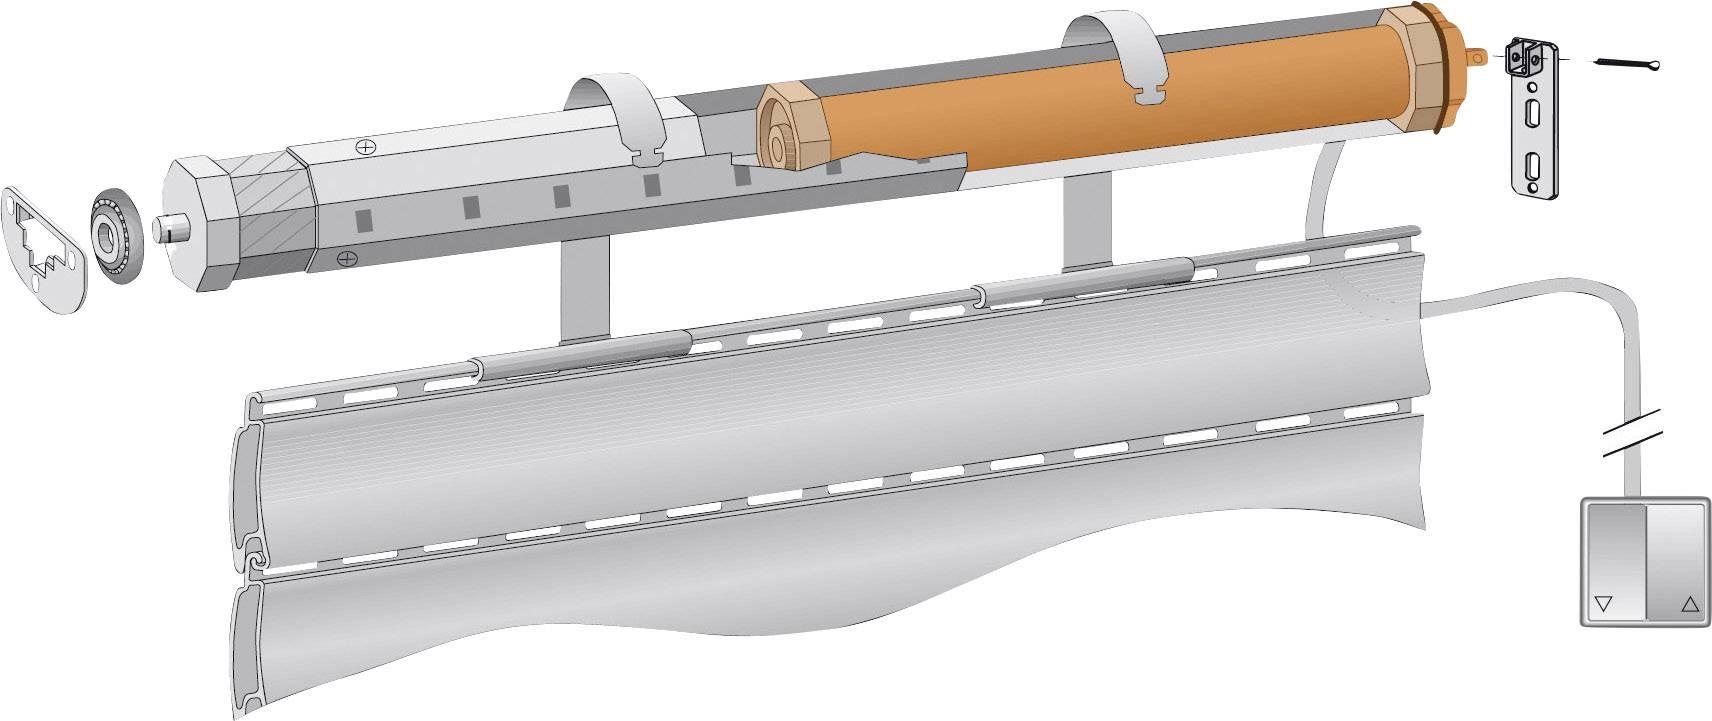 Sada trubkového motora Kaiser Nienhaus Favorit Classic Eco, ťah až 5 m2